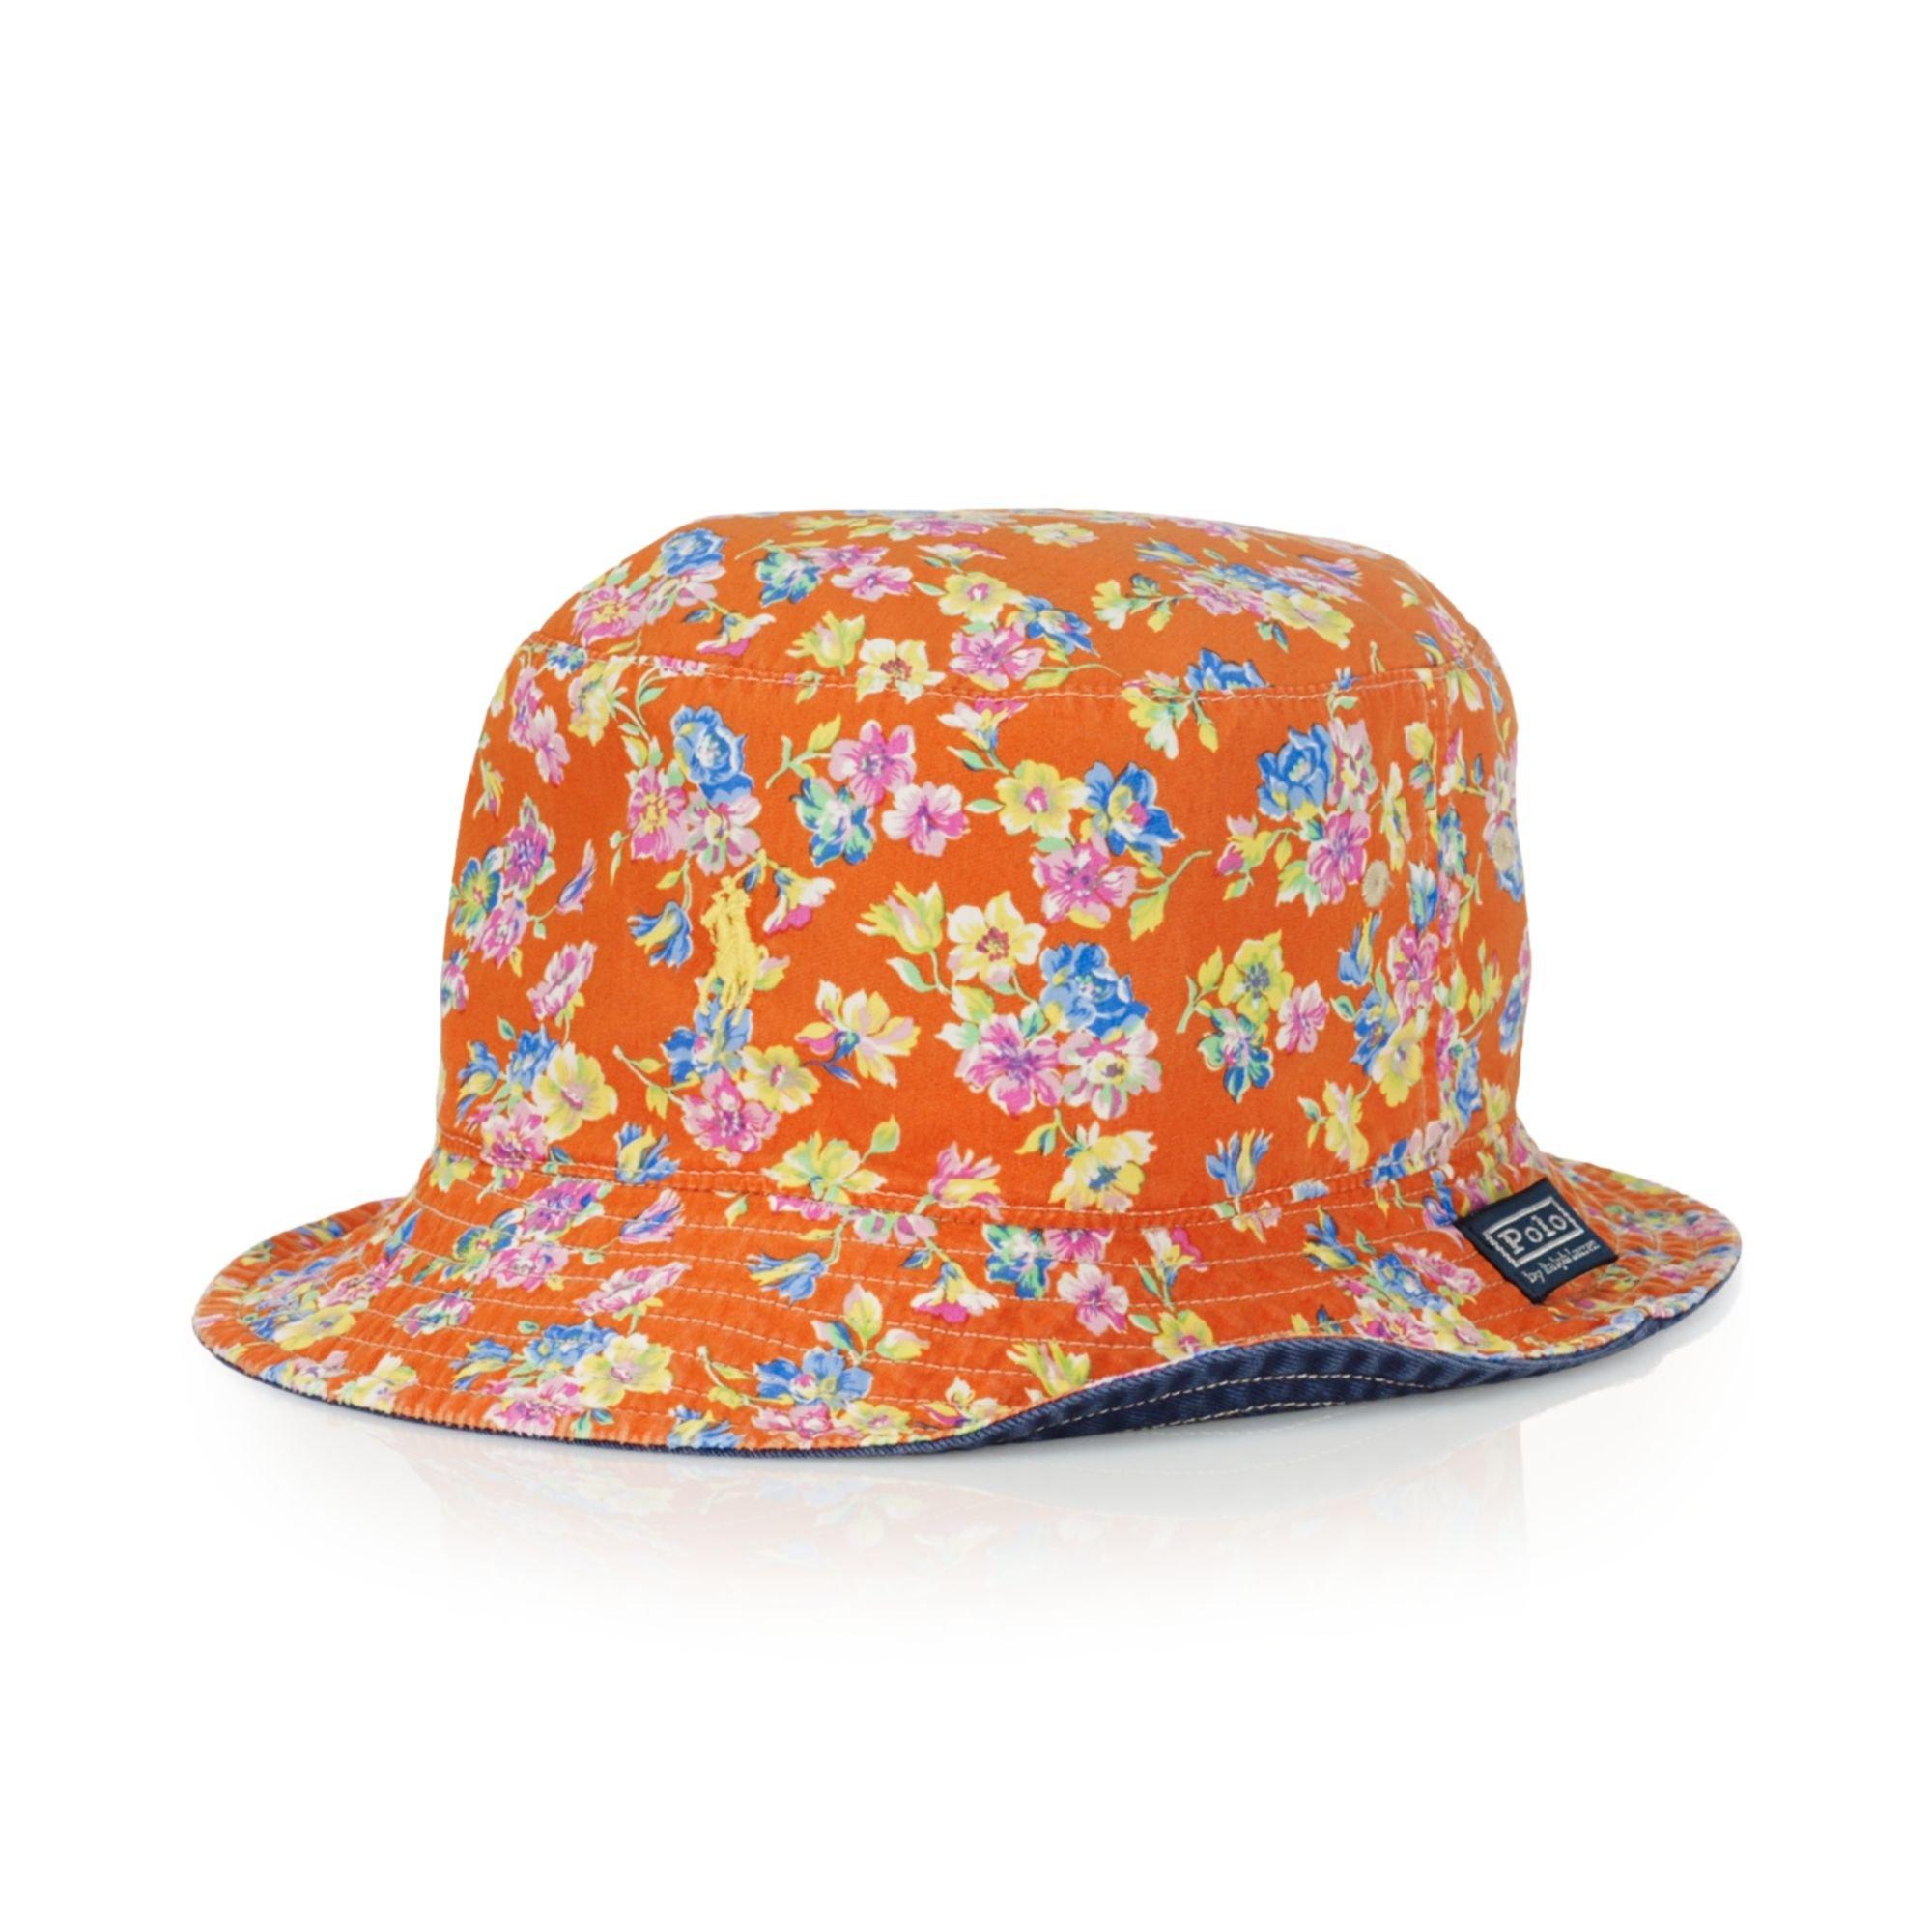 1f969417e93fc Ralph Lauren Polo Reversible Floralprint Bucket Hat in Orange for ...